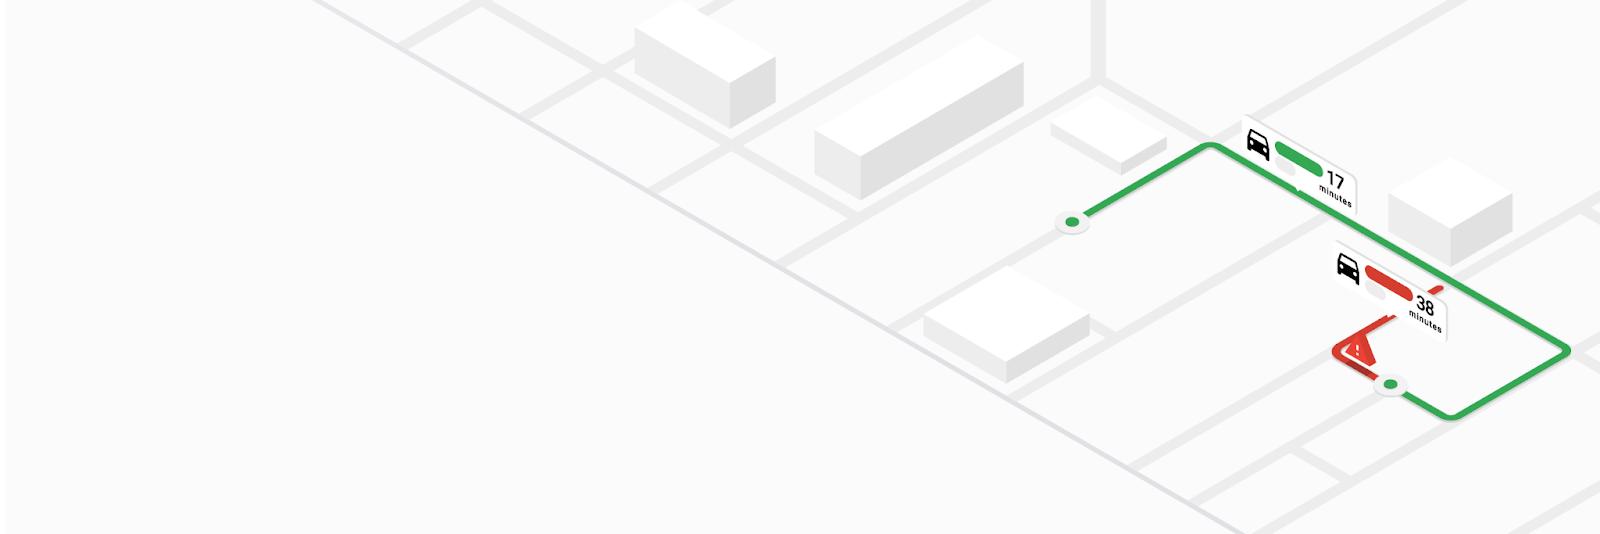 memasang-google-maps-ilustrasi-rute